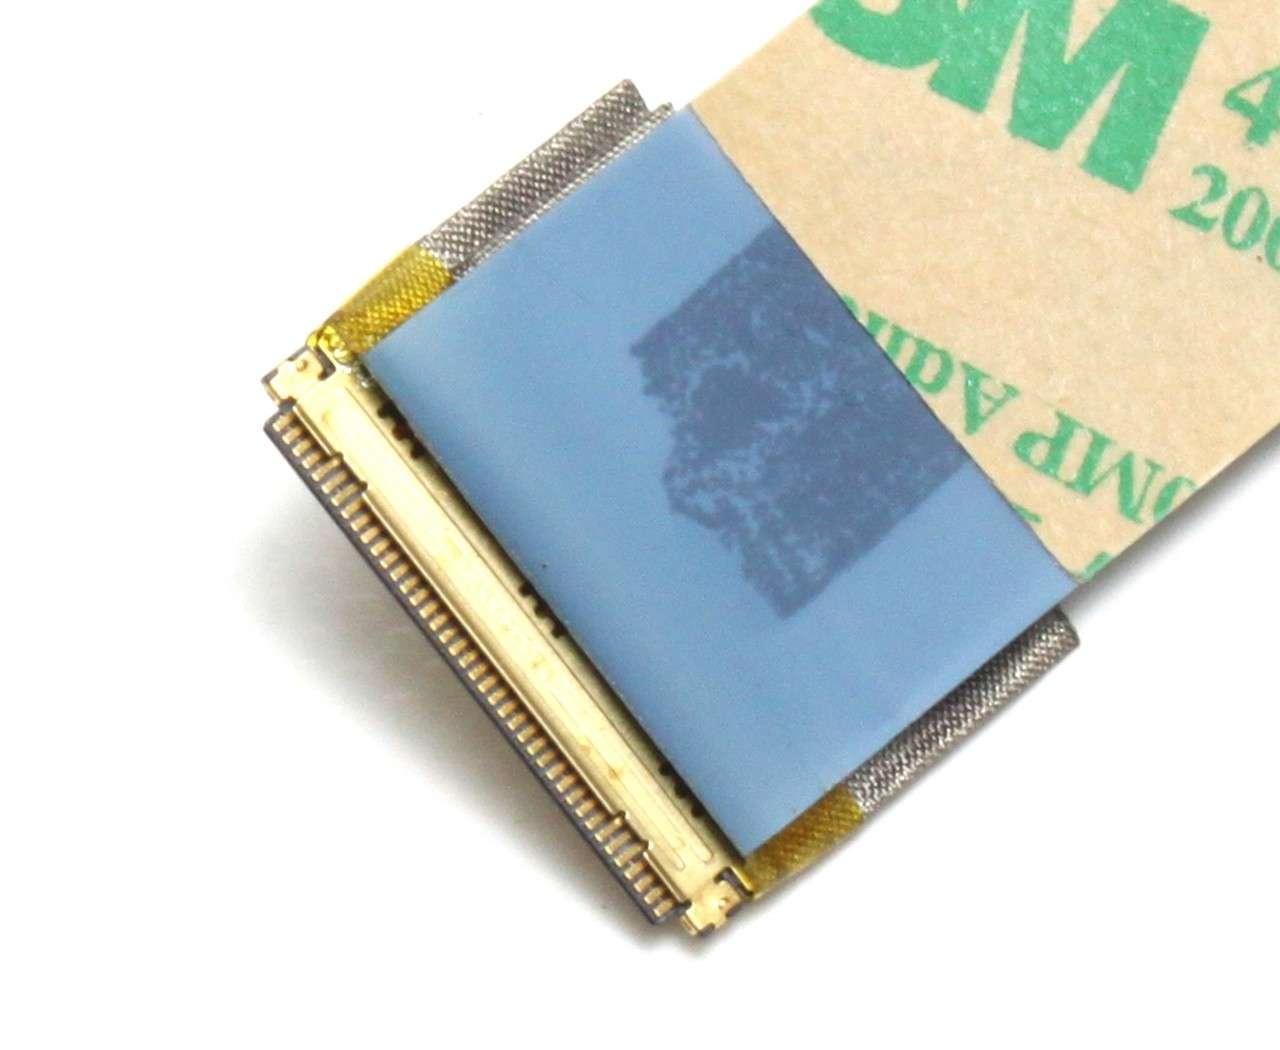 Cablu video LVDS Asus 1422 00S8000 imagine powerlaptop.ro 2021